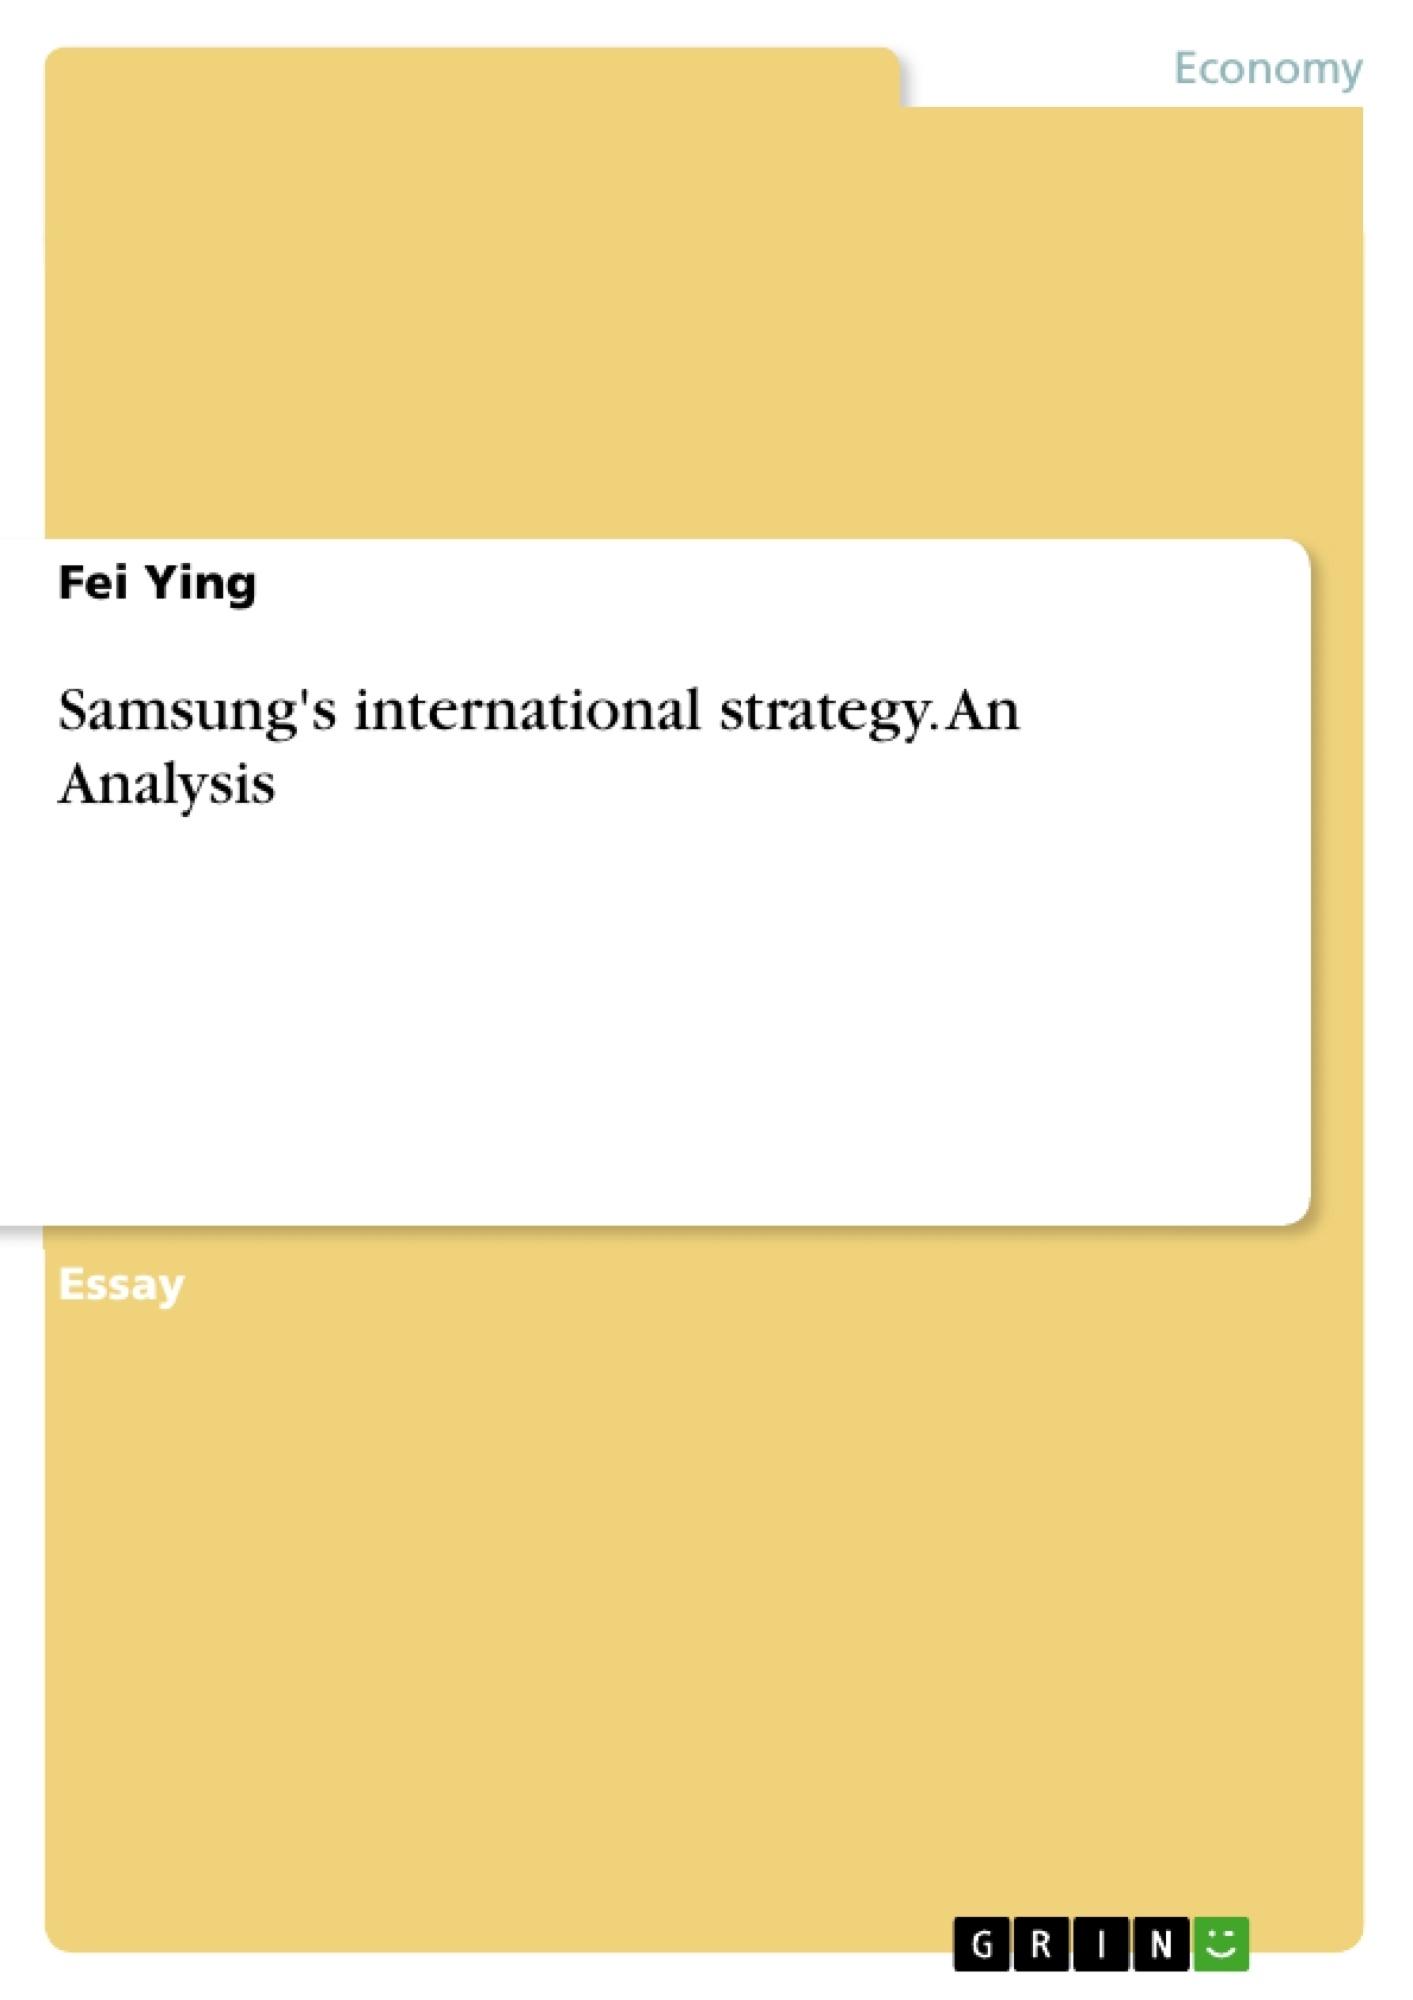 Title: Samsung's international strategy. An Analysis